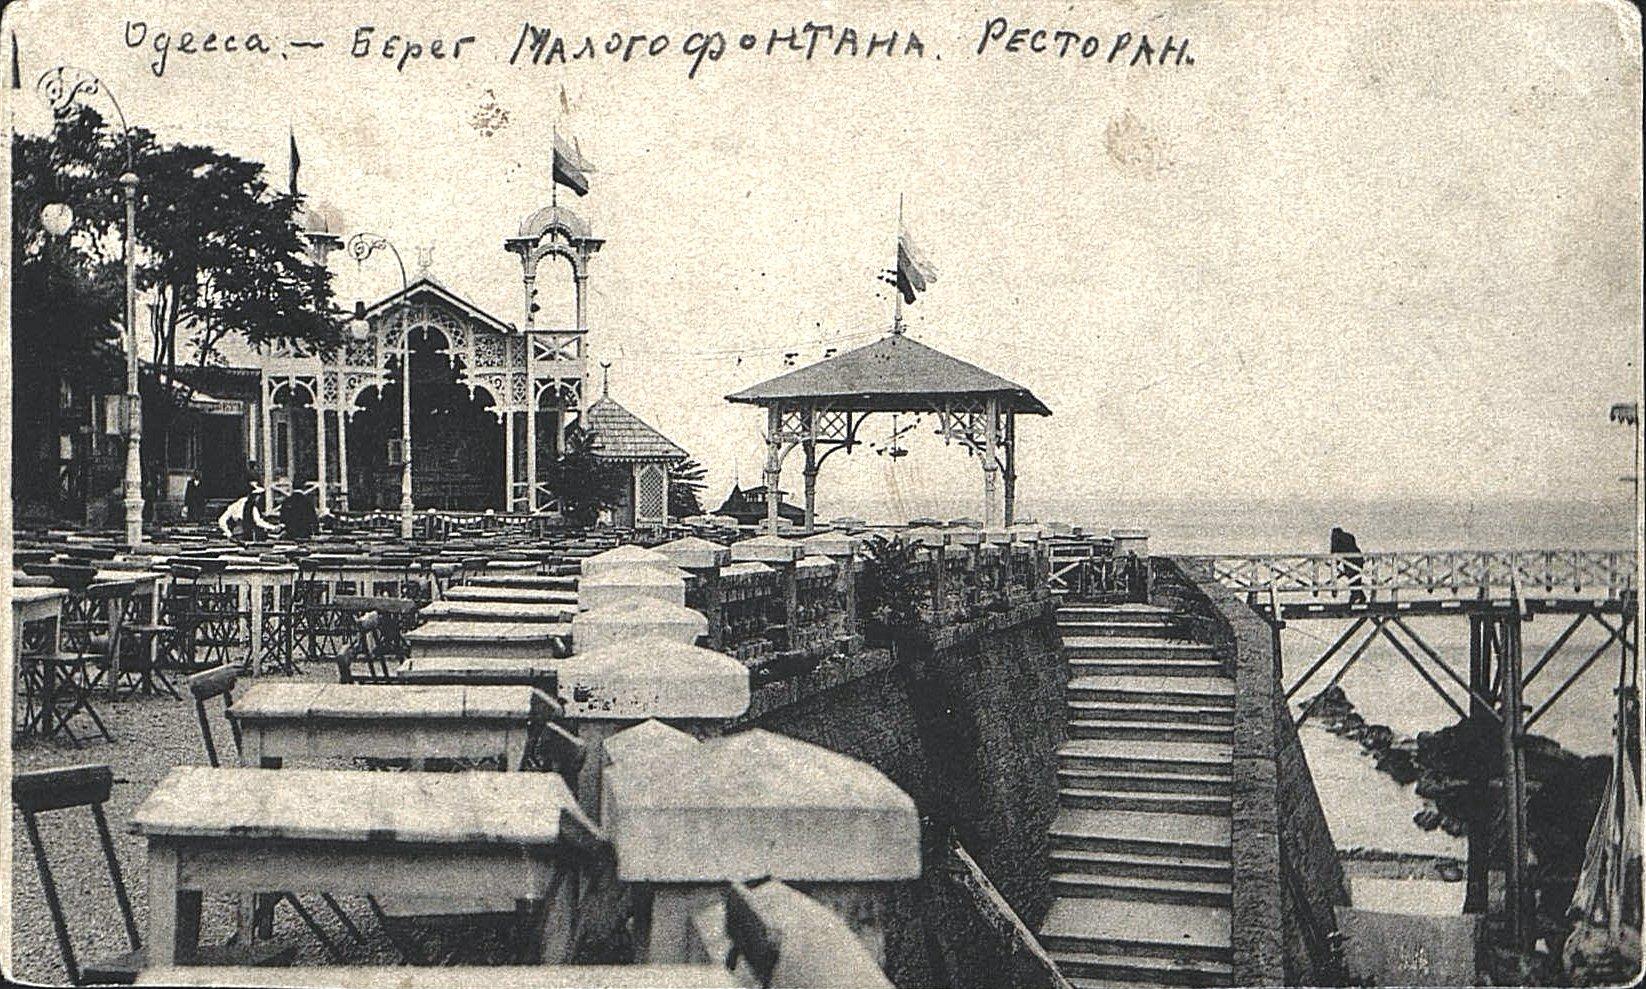 Берег Малого фонтана. Ресторан